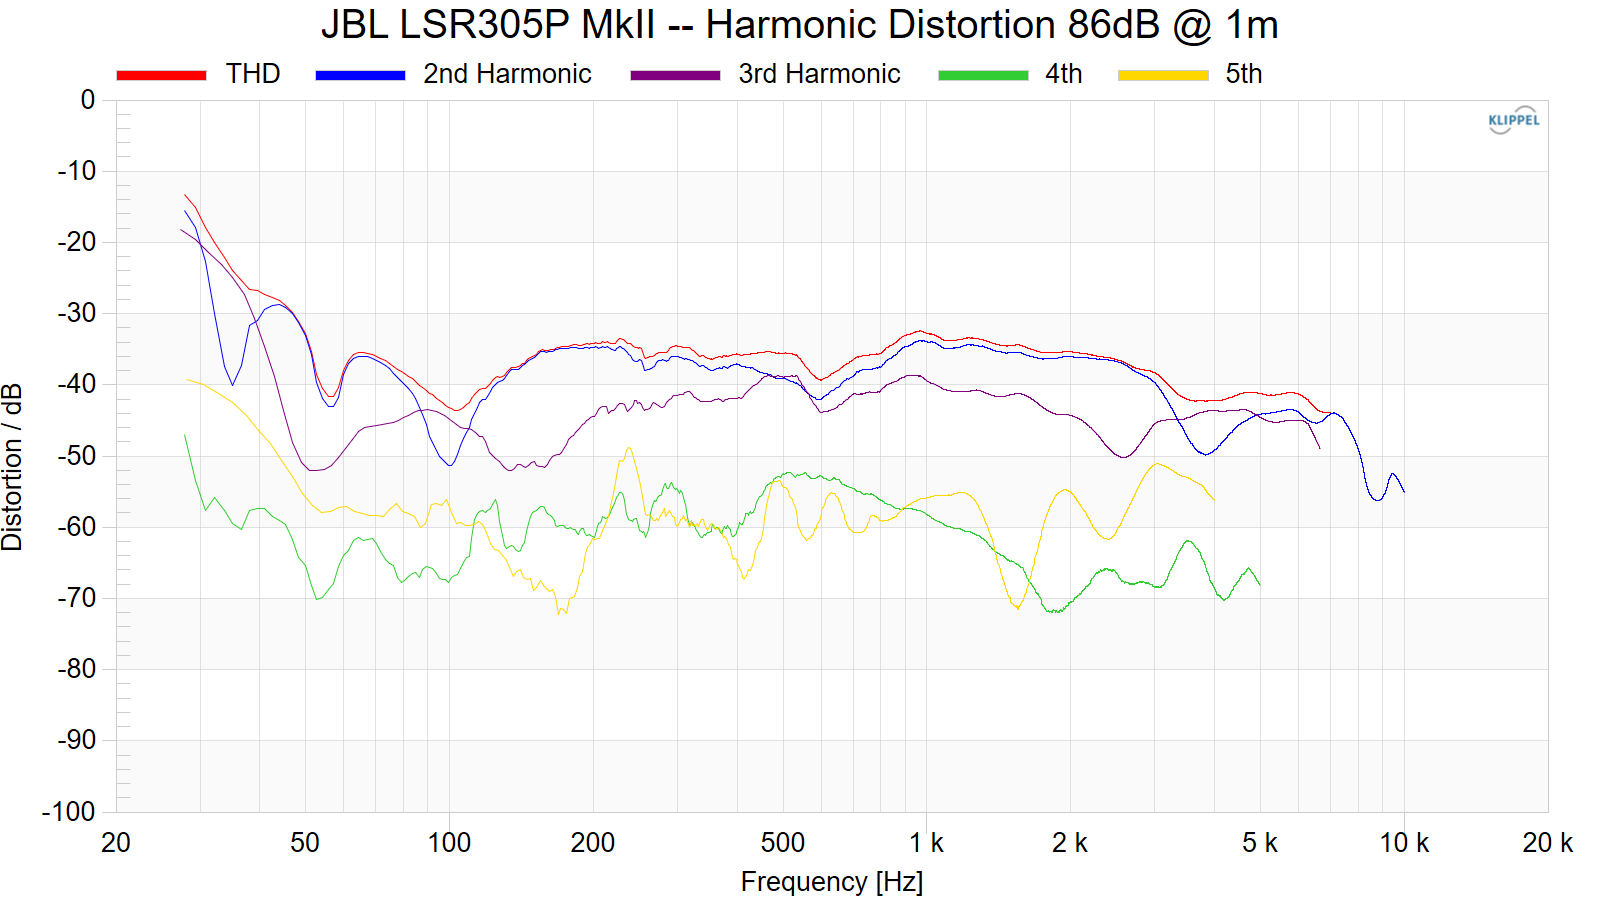 JBL%20LSR305P%20MkII%20--%20Harmonic%20Distortion%2086dB%20%40%201m.png